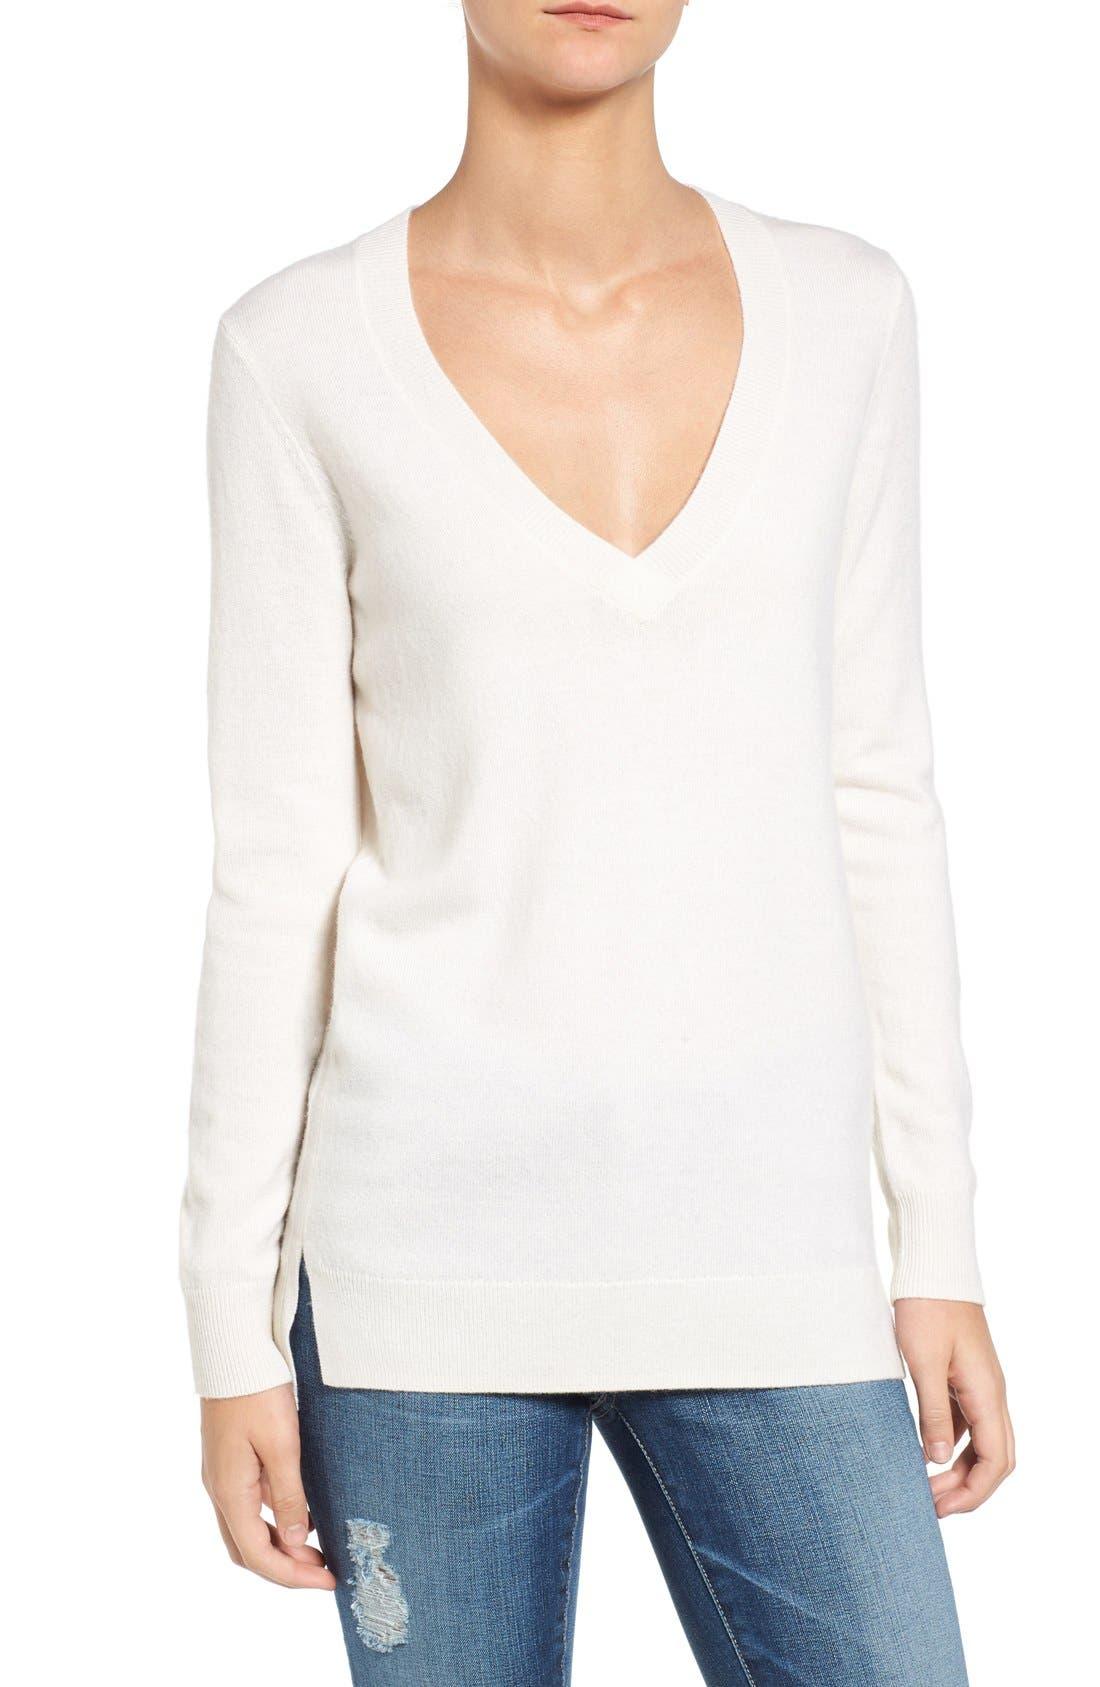 Luna V-Neck Merino & Cashmere Tunic Sweater,                             Main thumbnail 1, color,                             Powdered White